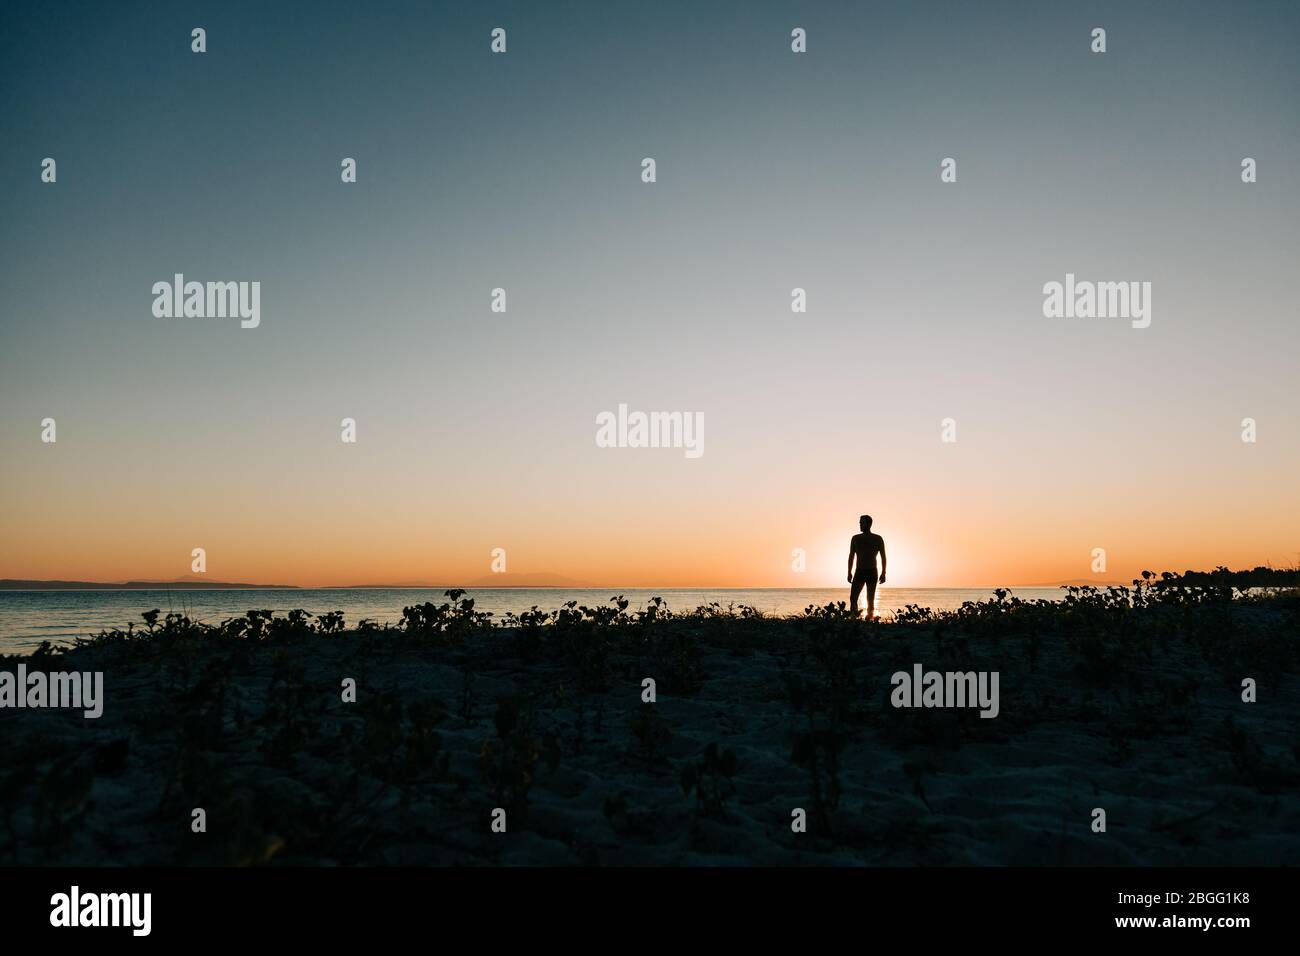 Silhouette of a man enjoying sunset on the beach Stock Photo